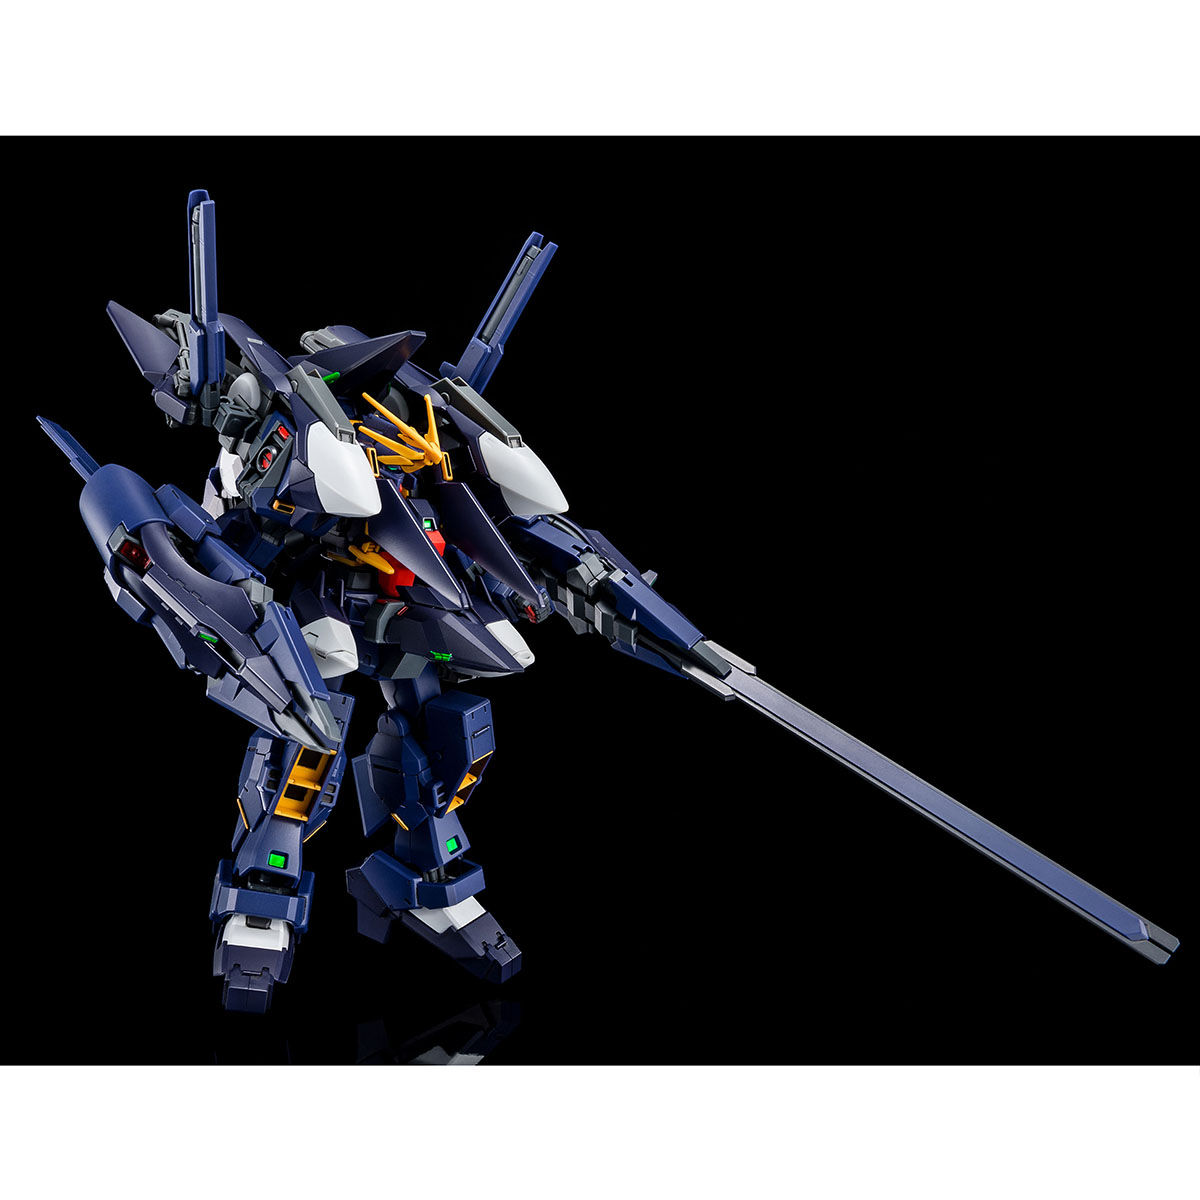 HG 1/144 GUNDAM TR-1 [HAZE'N-THLEY RAH Ⅱ] (ADVANCE OF Z THE FLAG OF TITANS)[Jan 2021 Delivery]